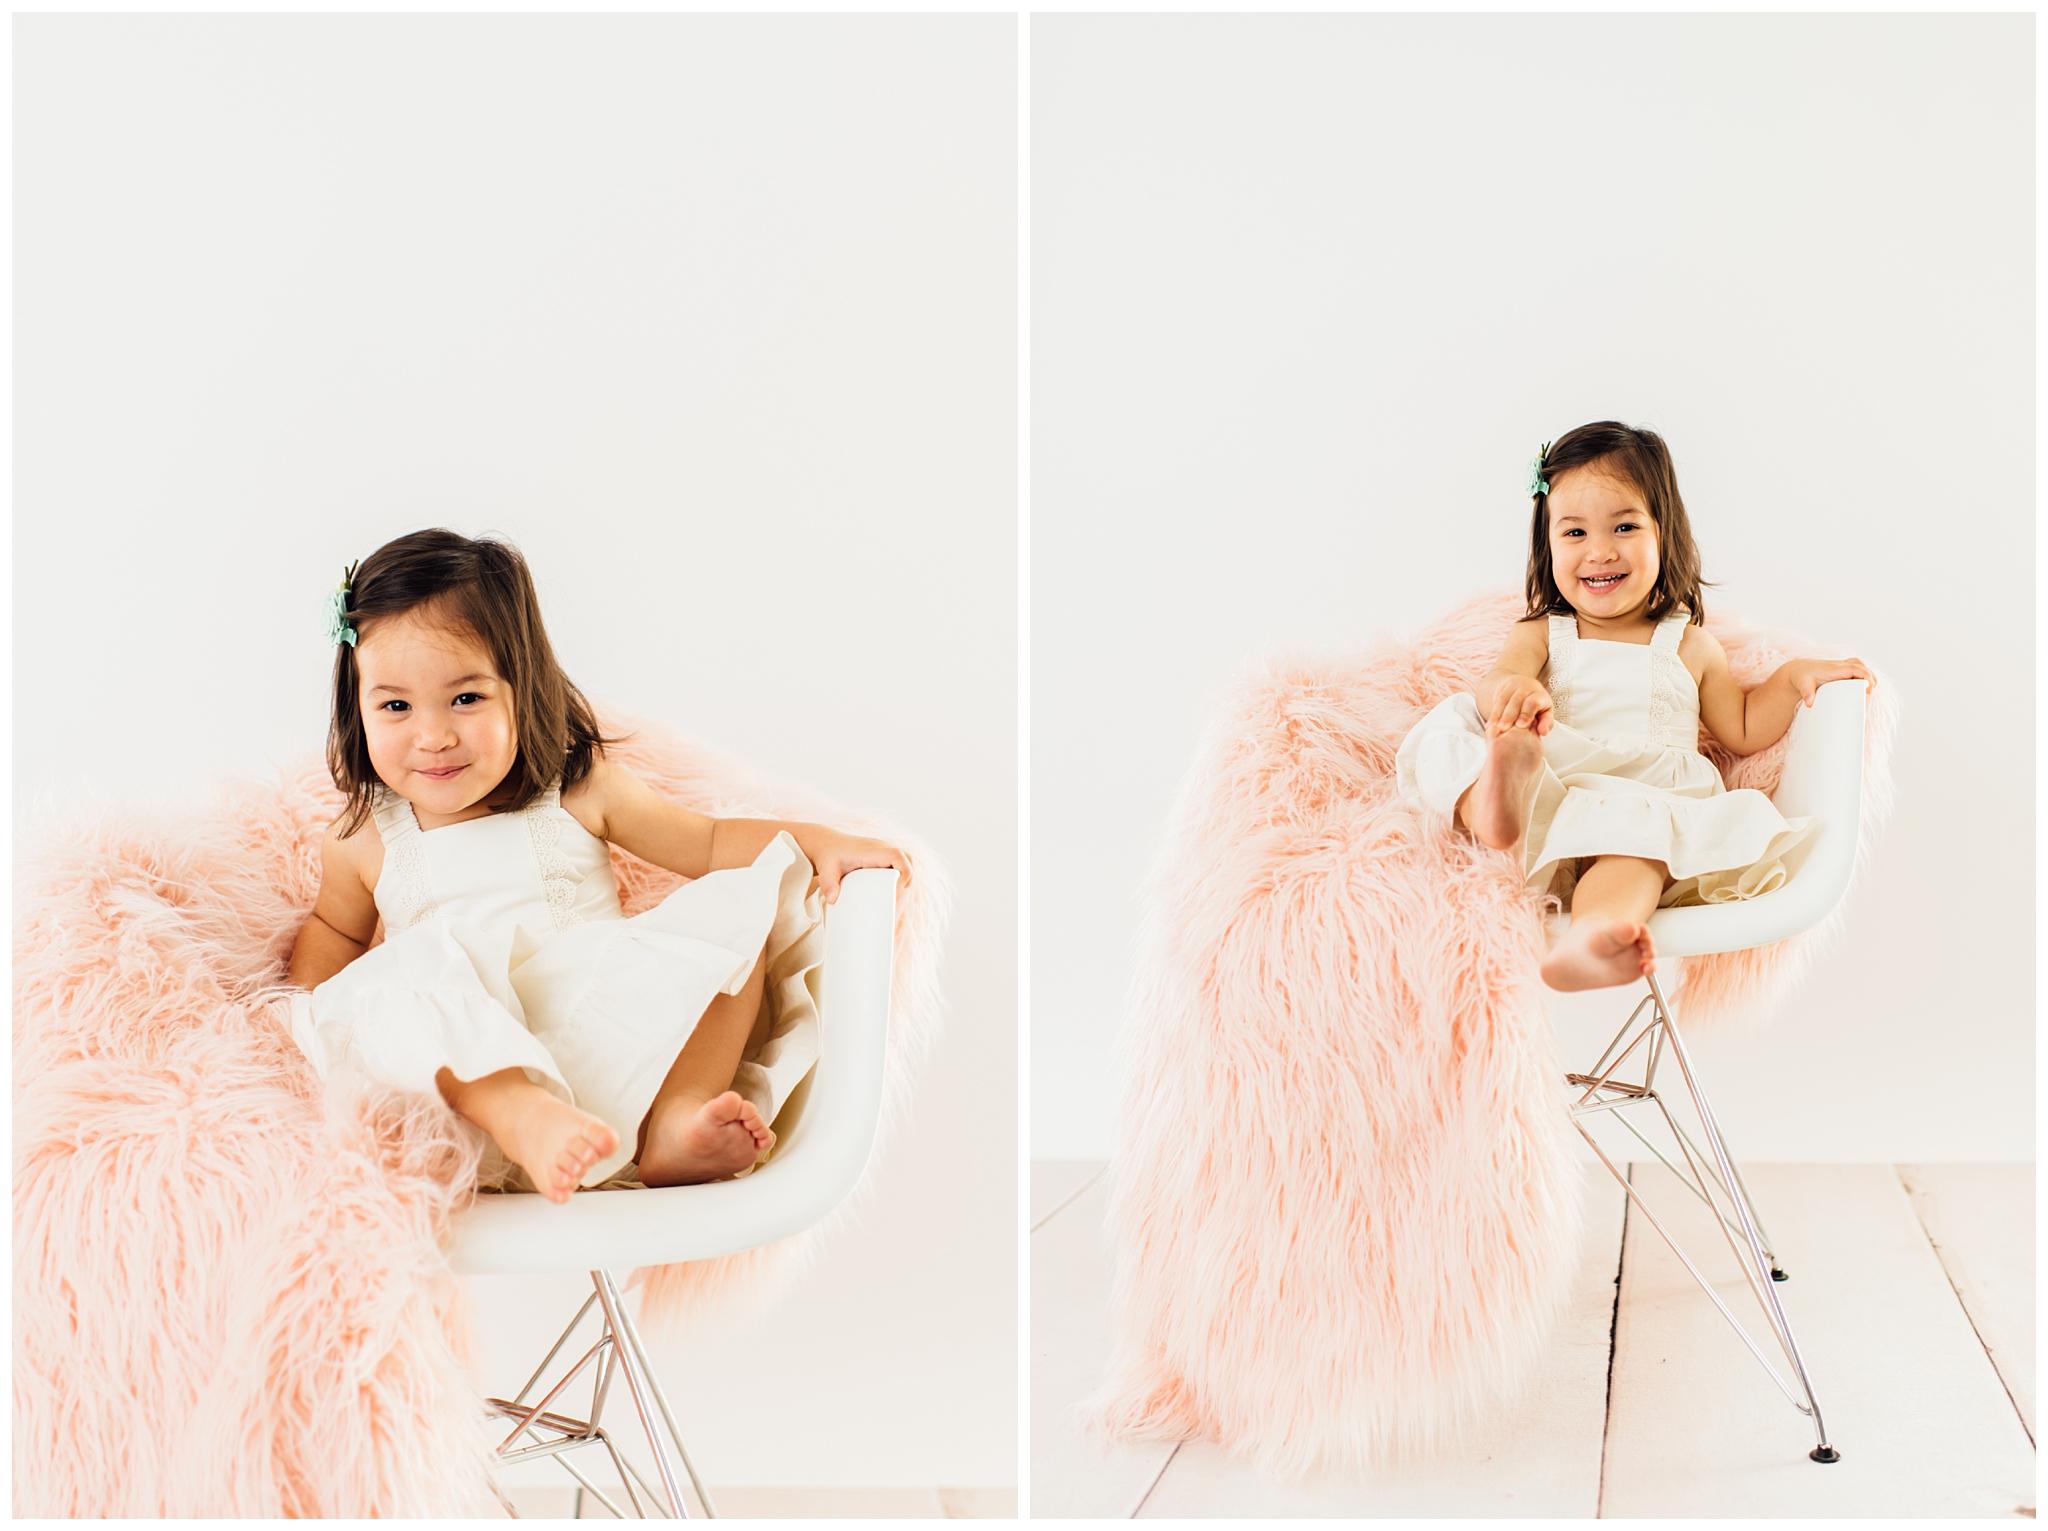 Studio Milestone Portrait Session | Phoenix Child + Baby Photographer_0010.jpg